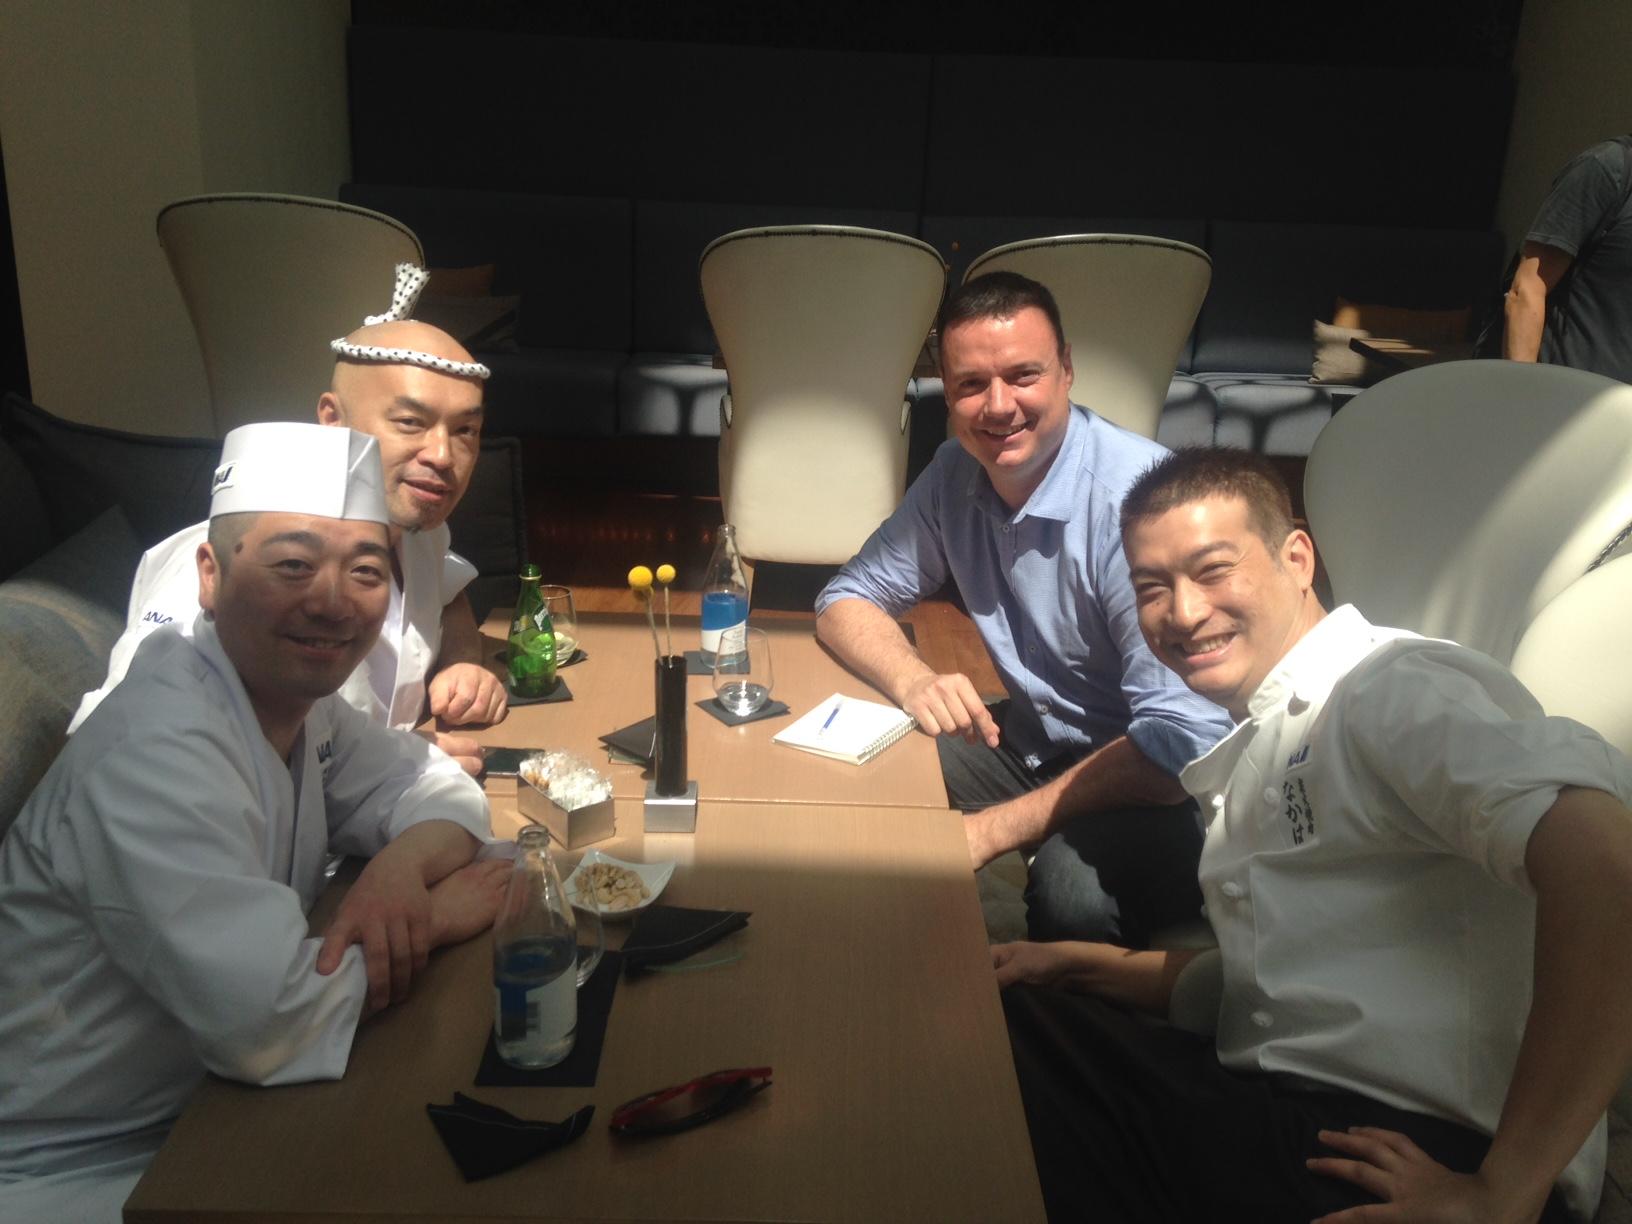 Sugita, Ikegawa, Ortuño y Nakahara